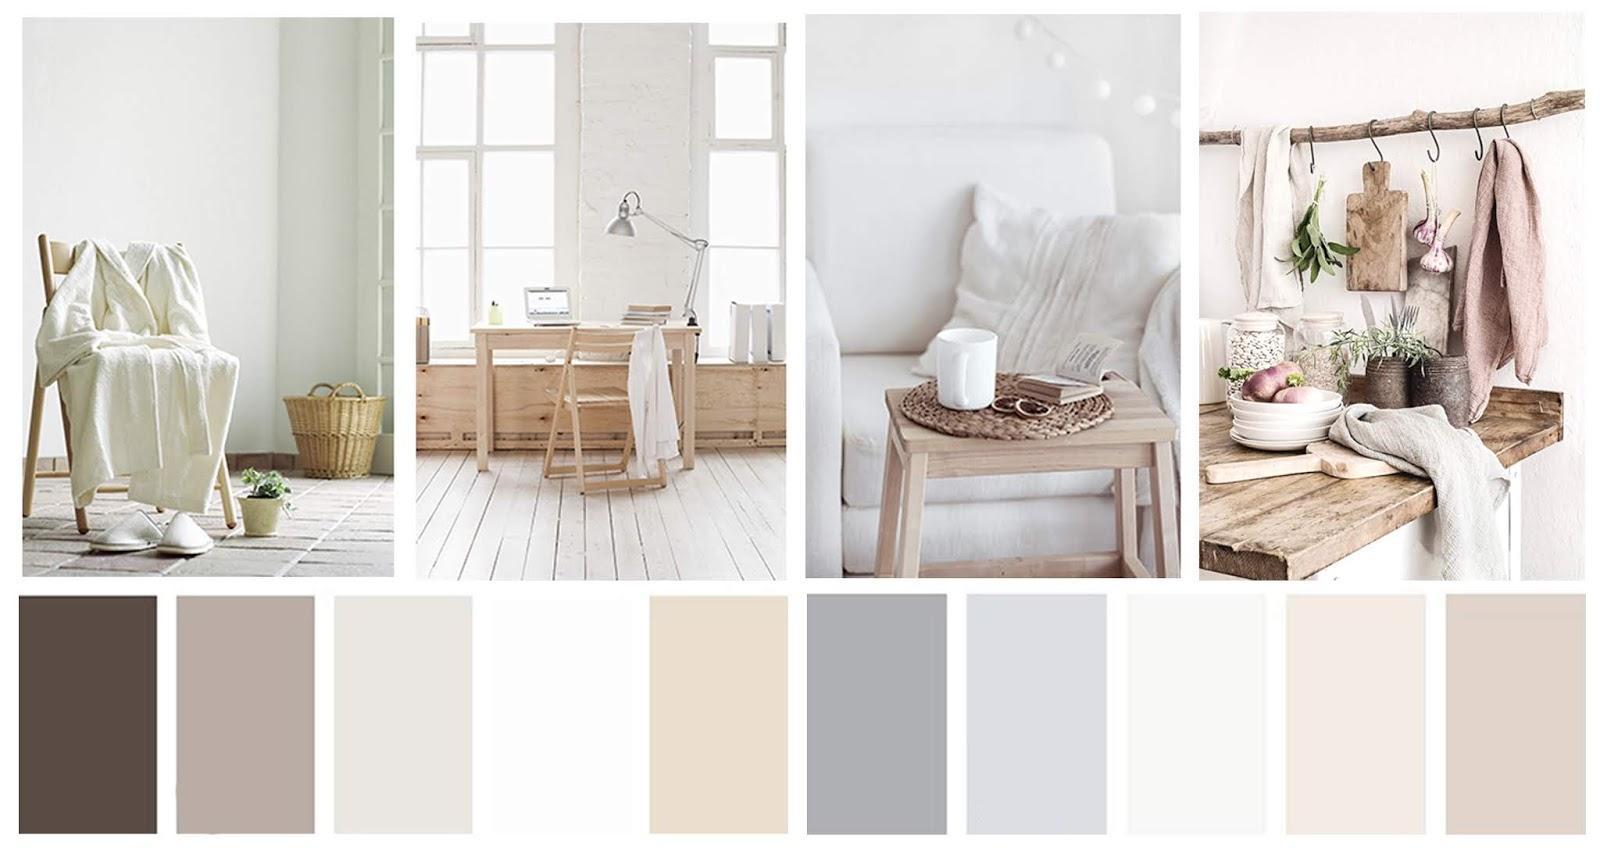 decoración paleta de colores en tonos neutros